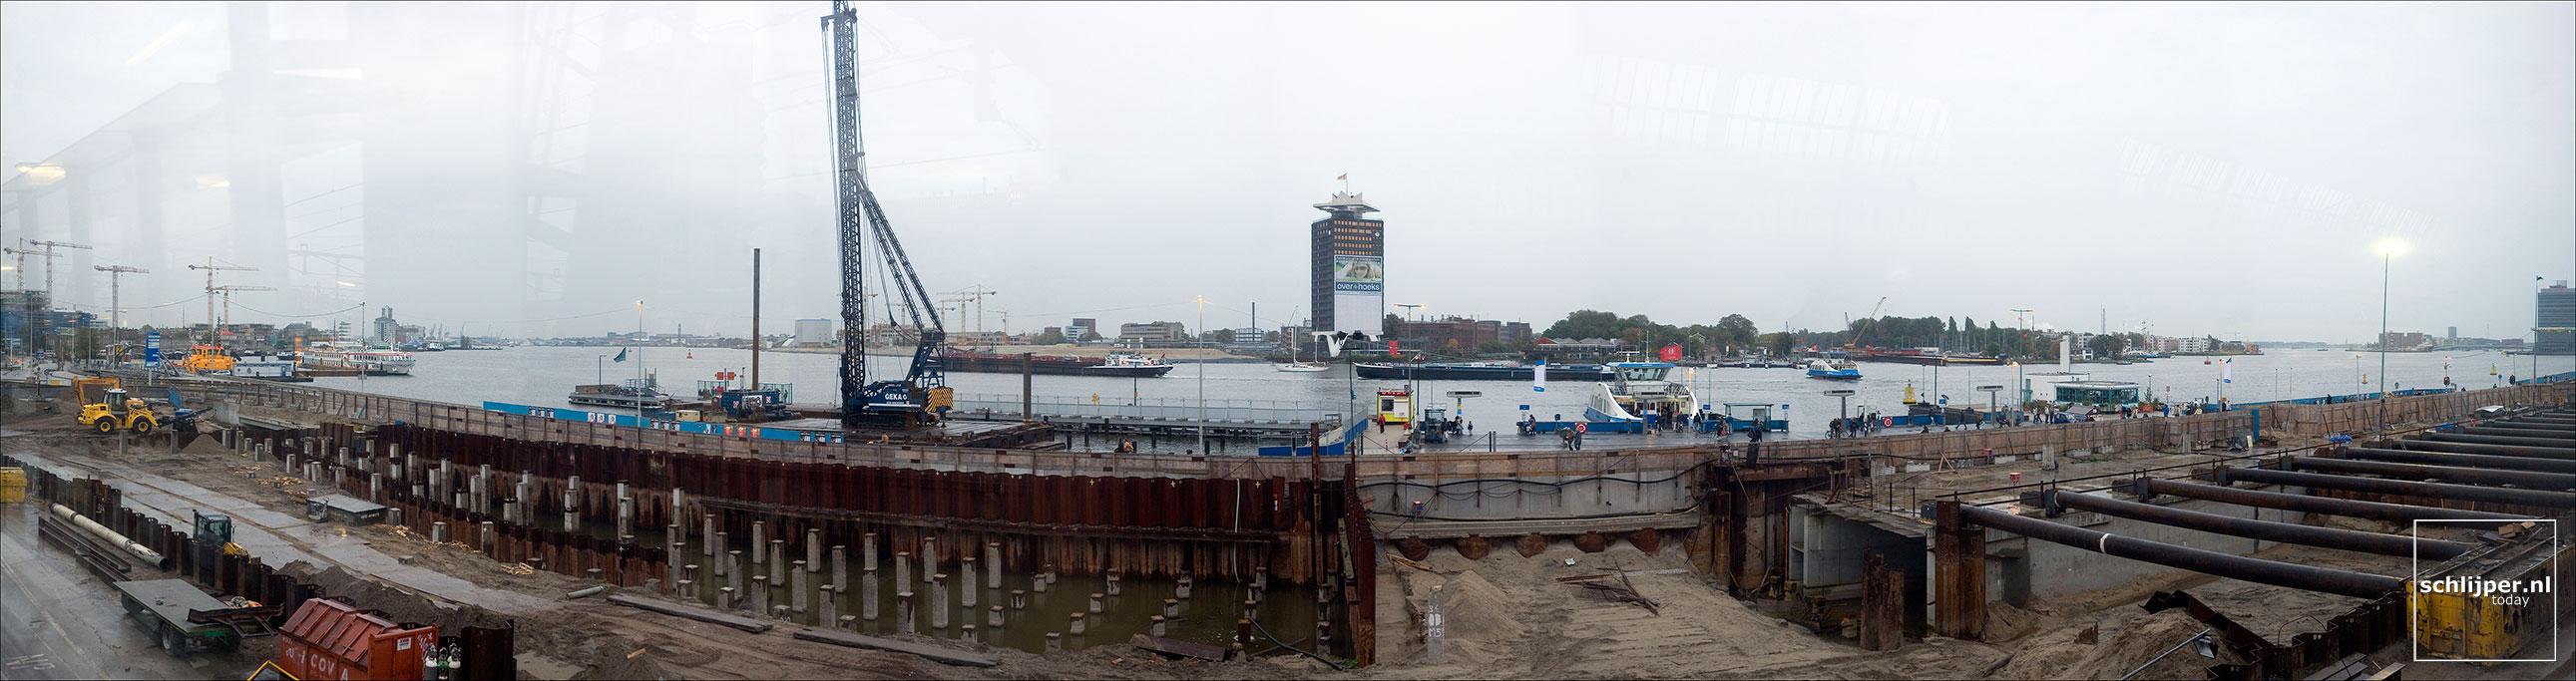 Nederland, Amsterdam, 22 oktober 2006